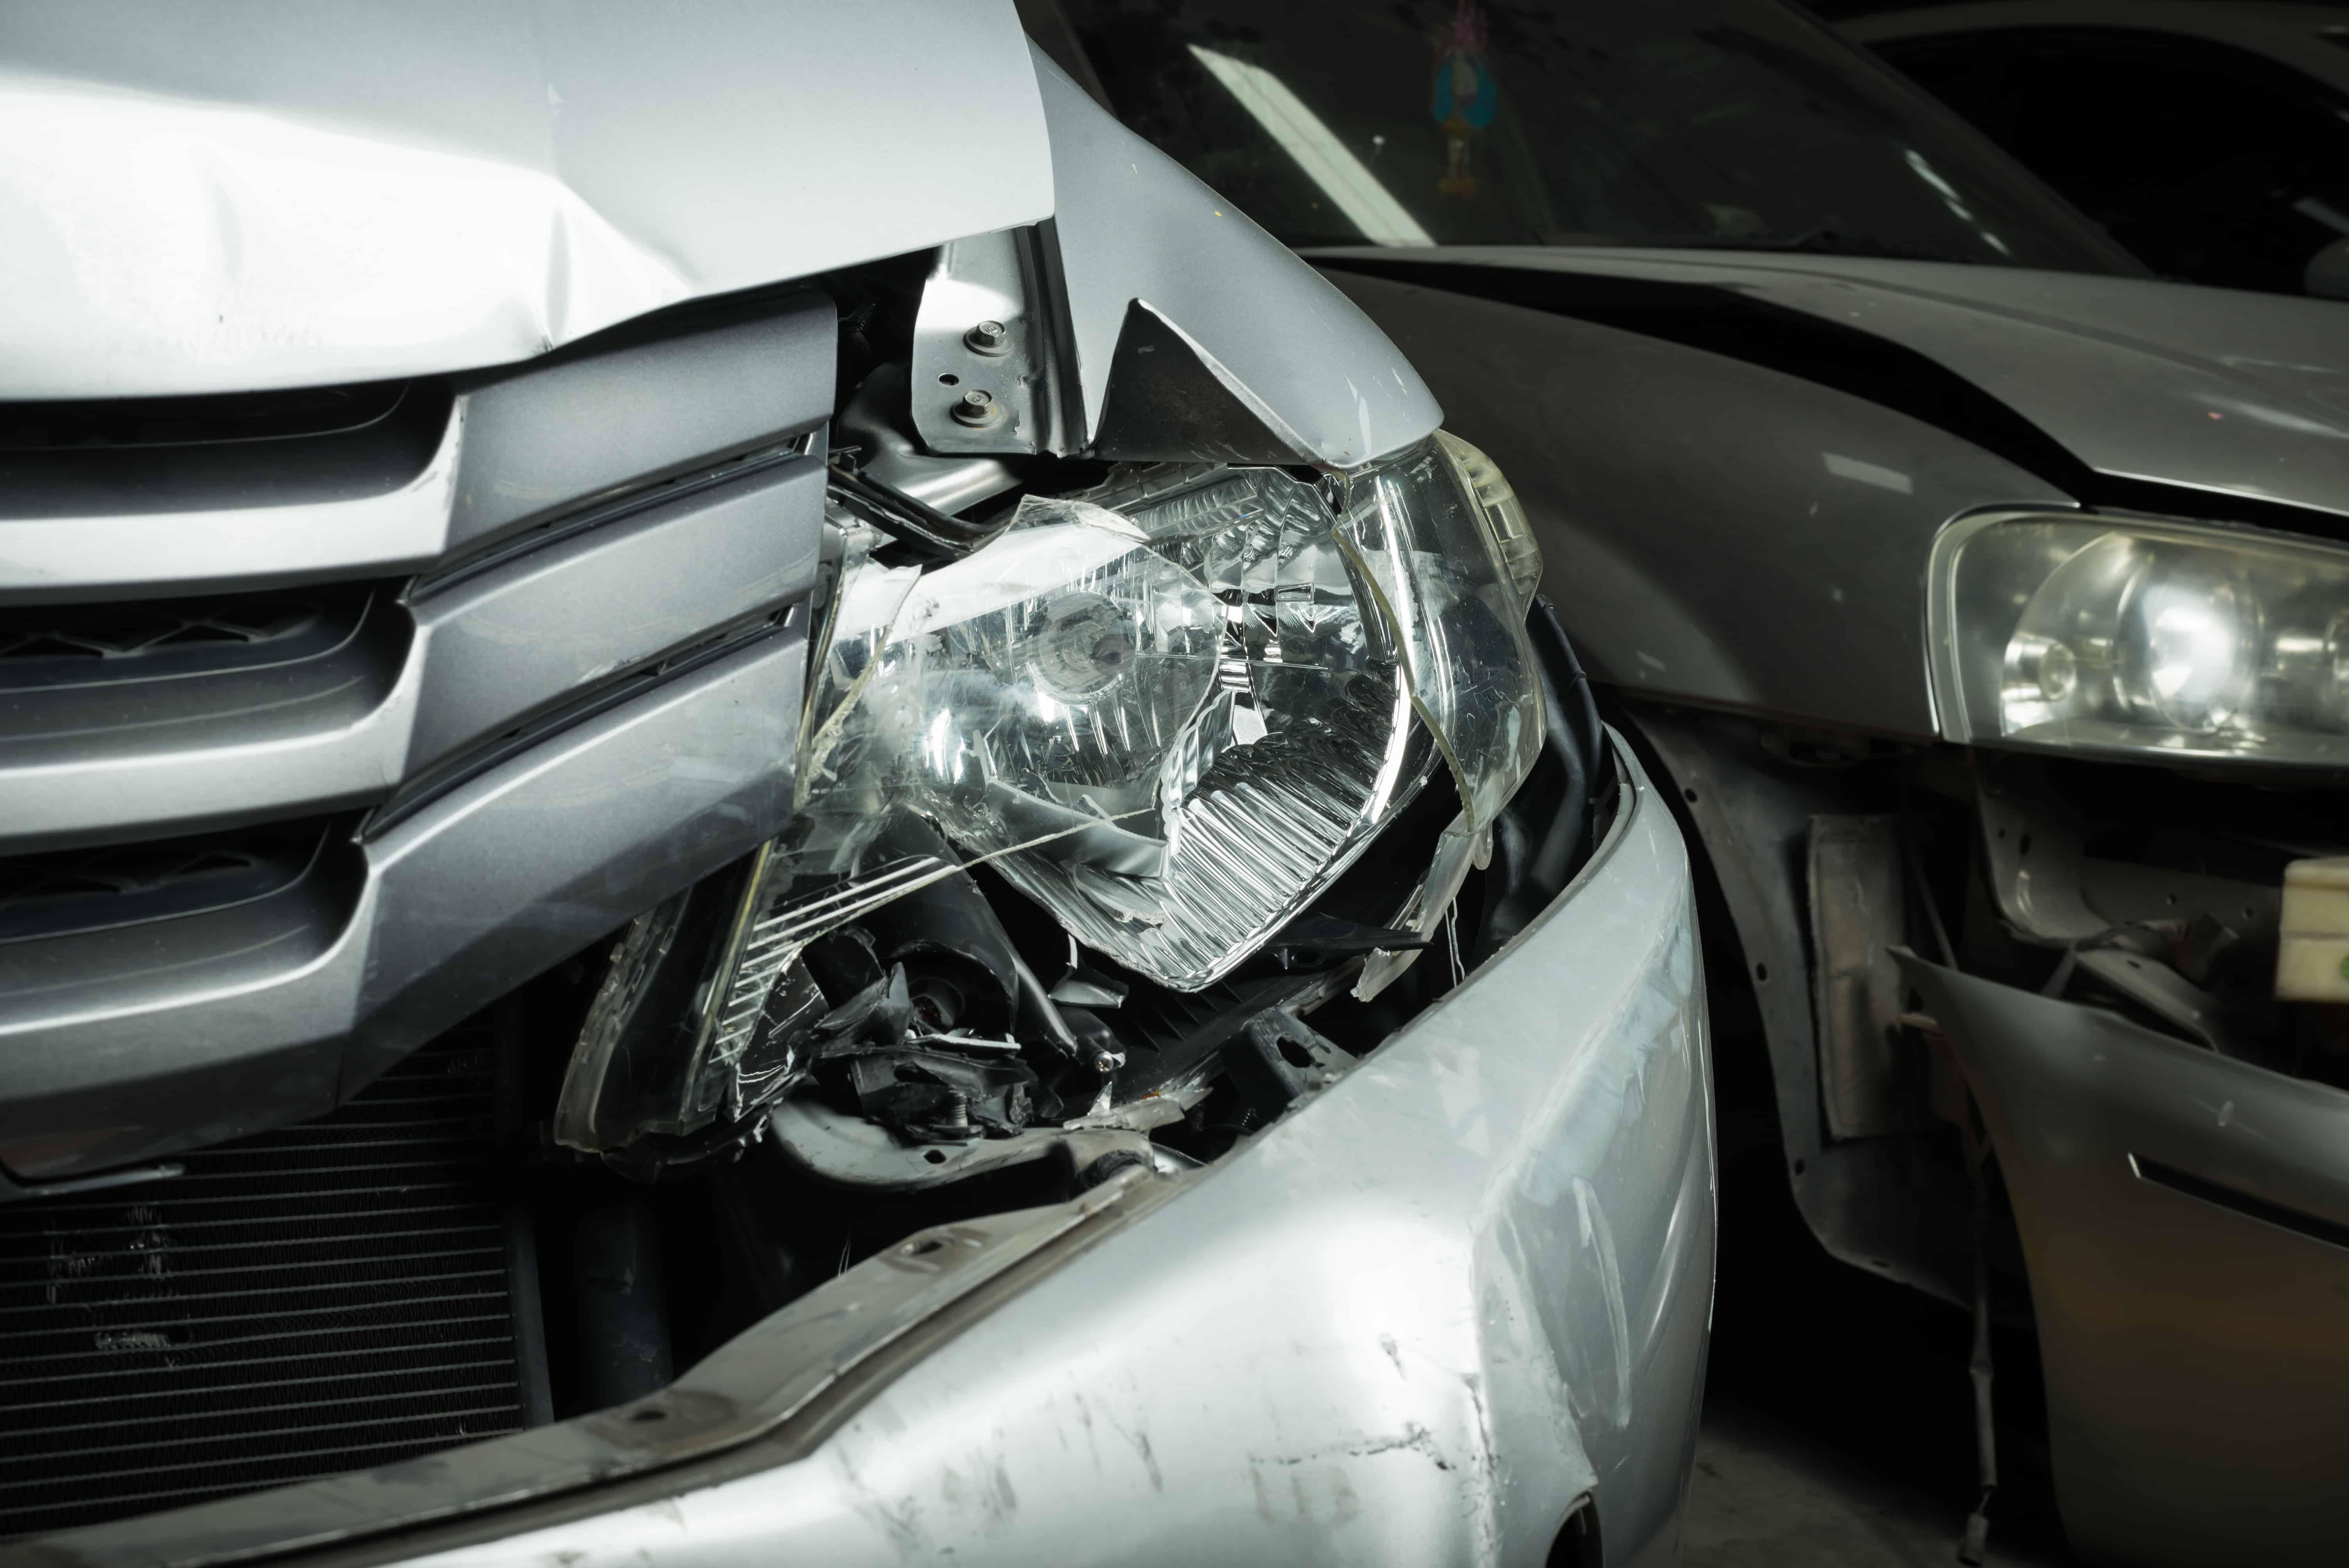 One Dies, Several Injured in Crash on South Pecos Road [Las Vegas, NV]